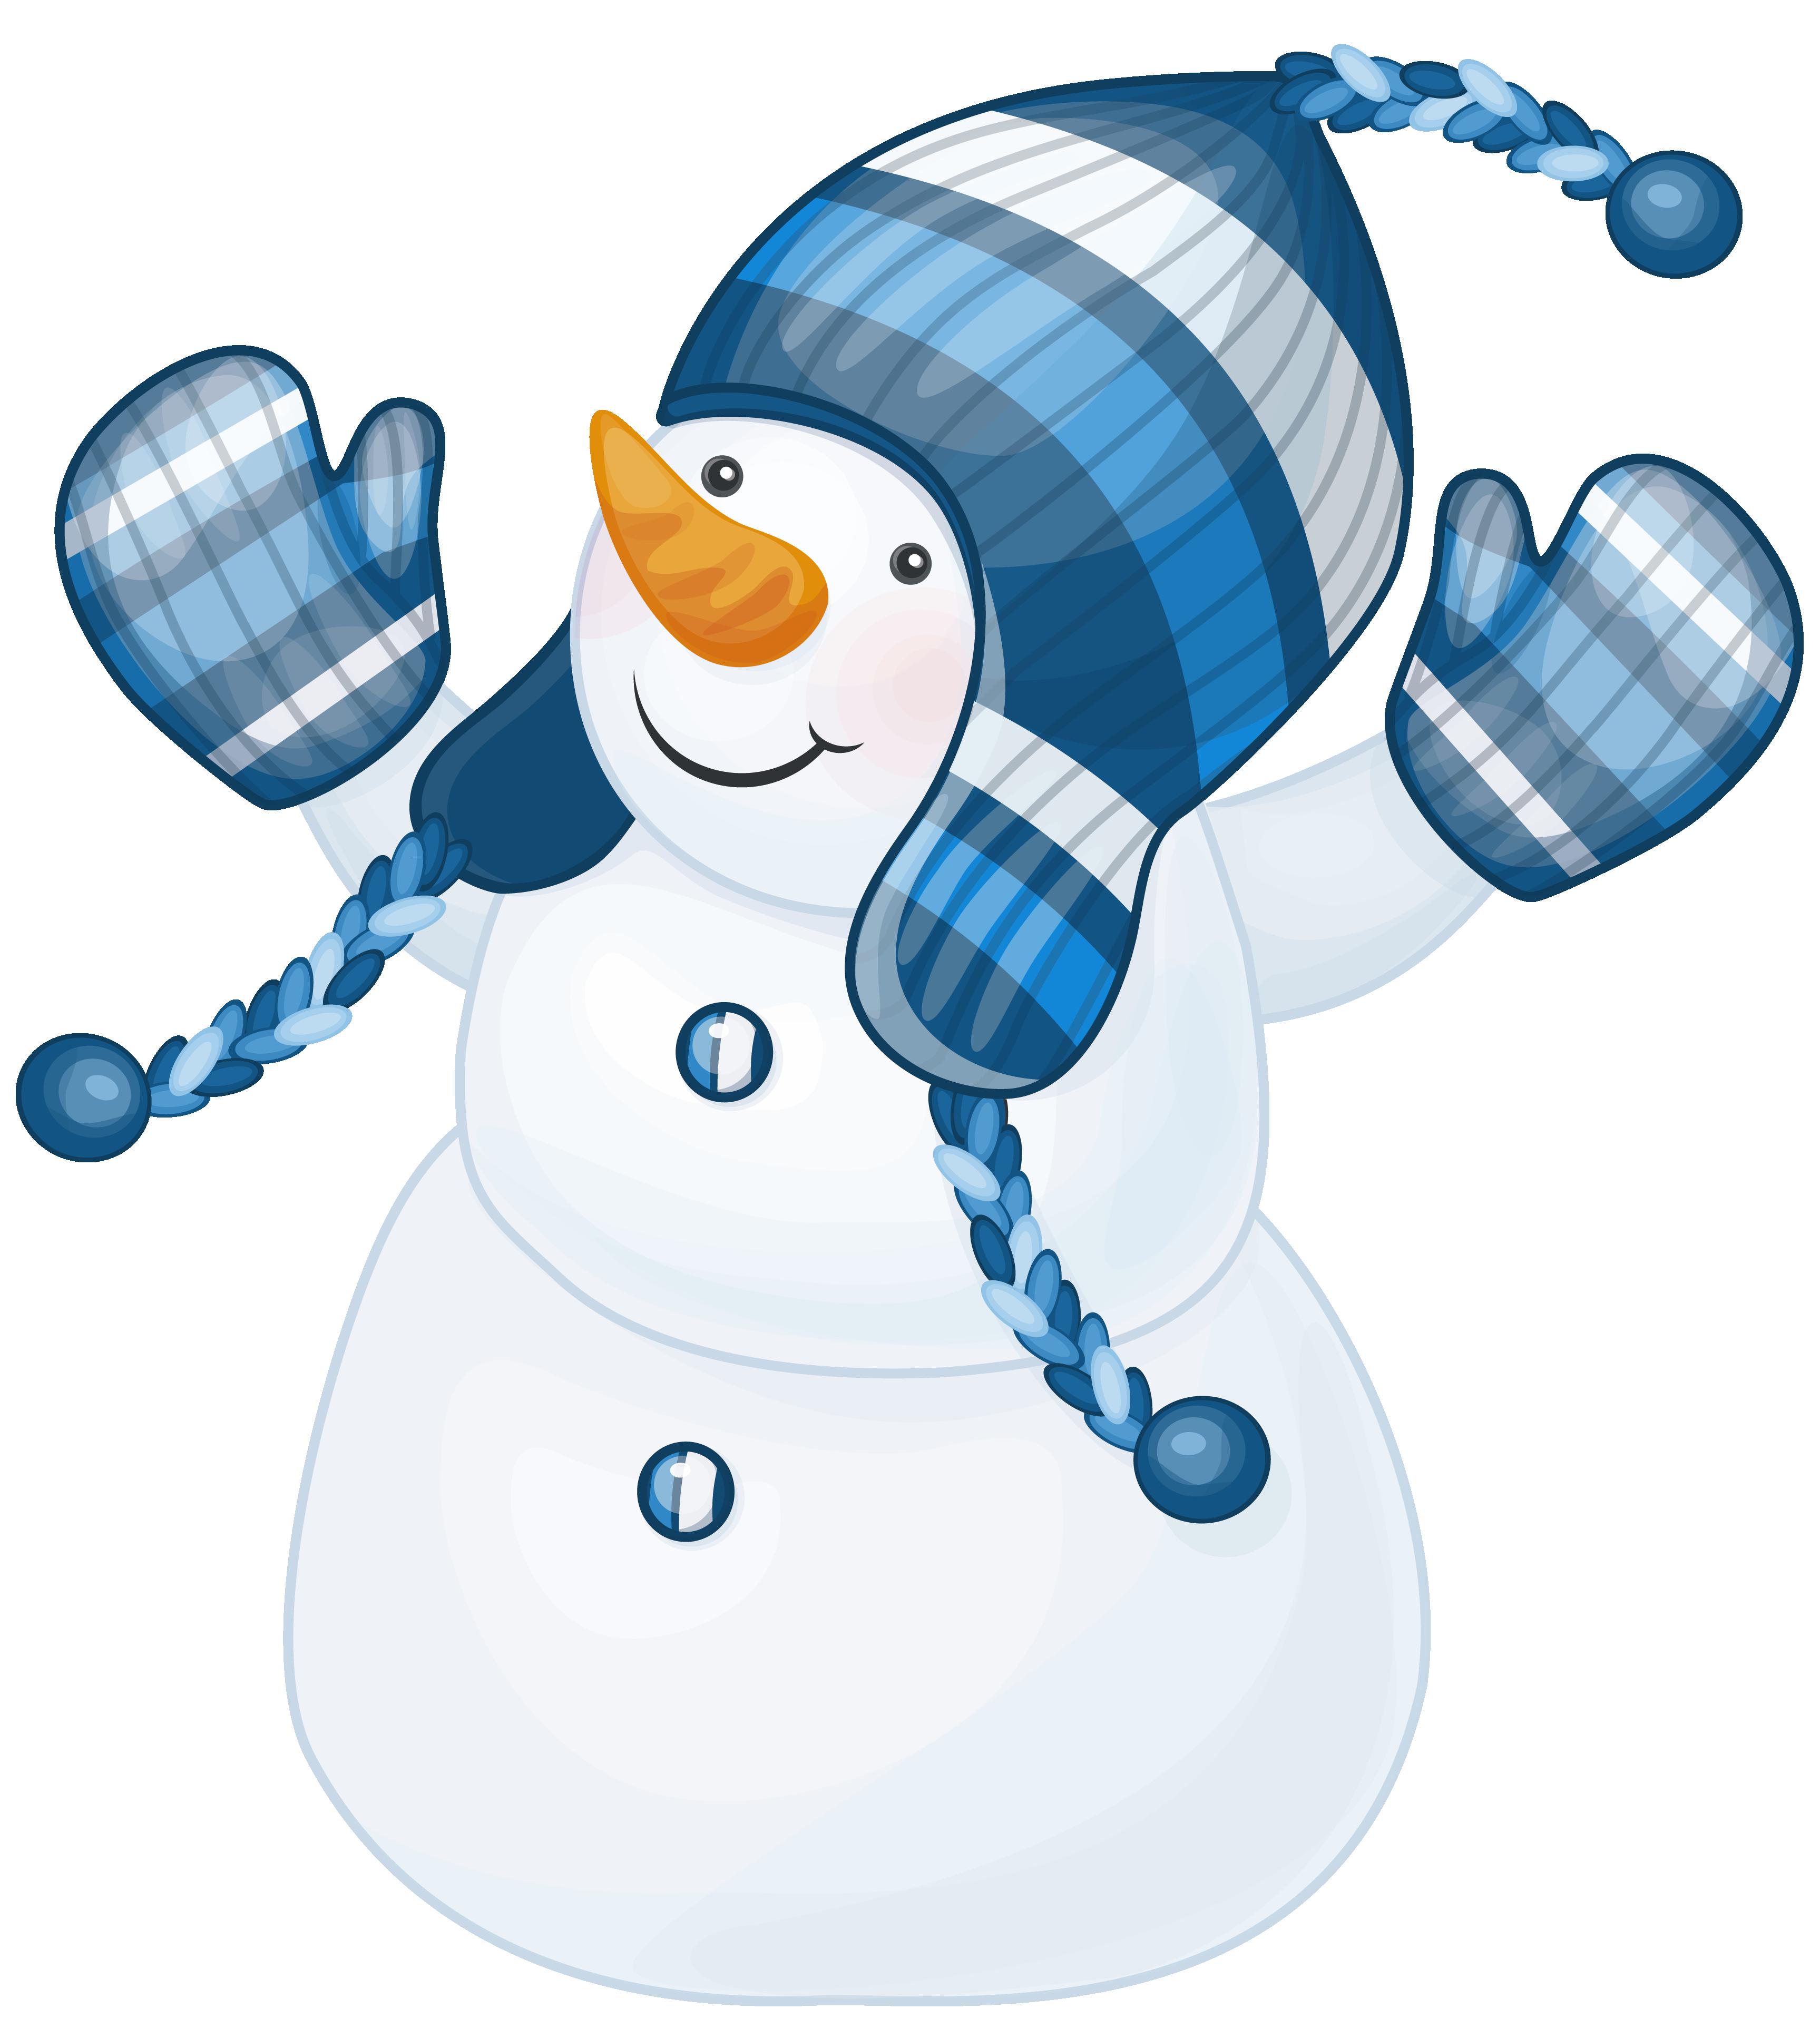 Snowman snowflake clipart clip free stock снеговик на коньках картинки: 23 тыс изображений найдено в Яндекс ... clip free stock